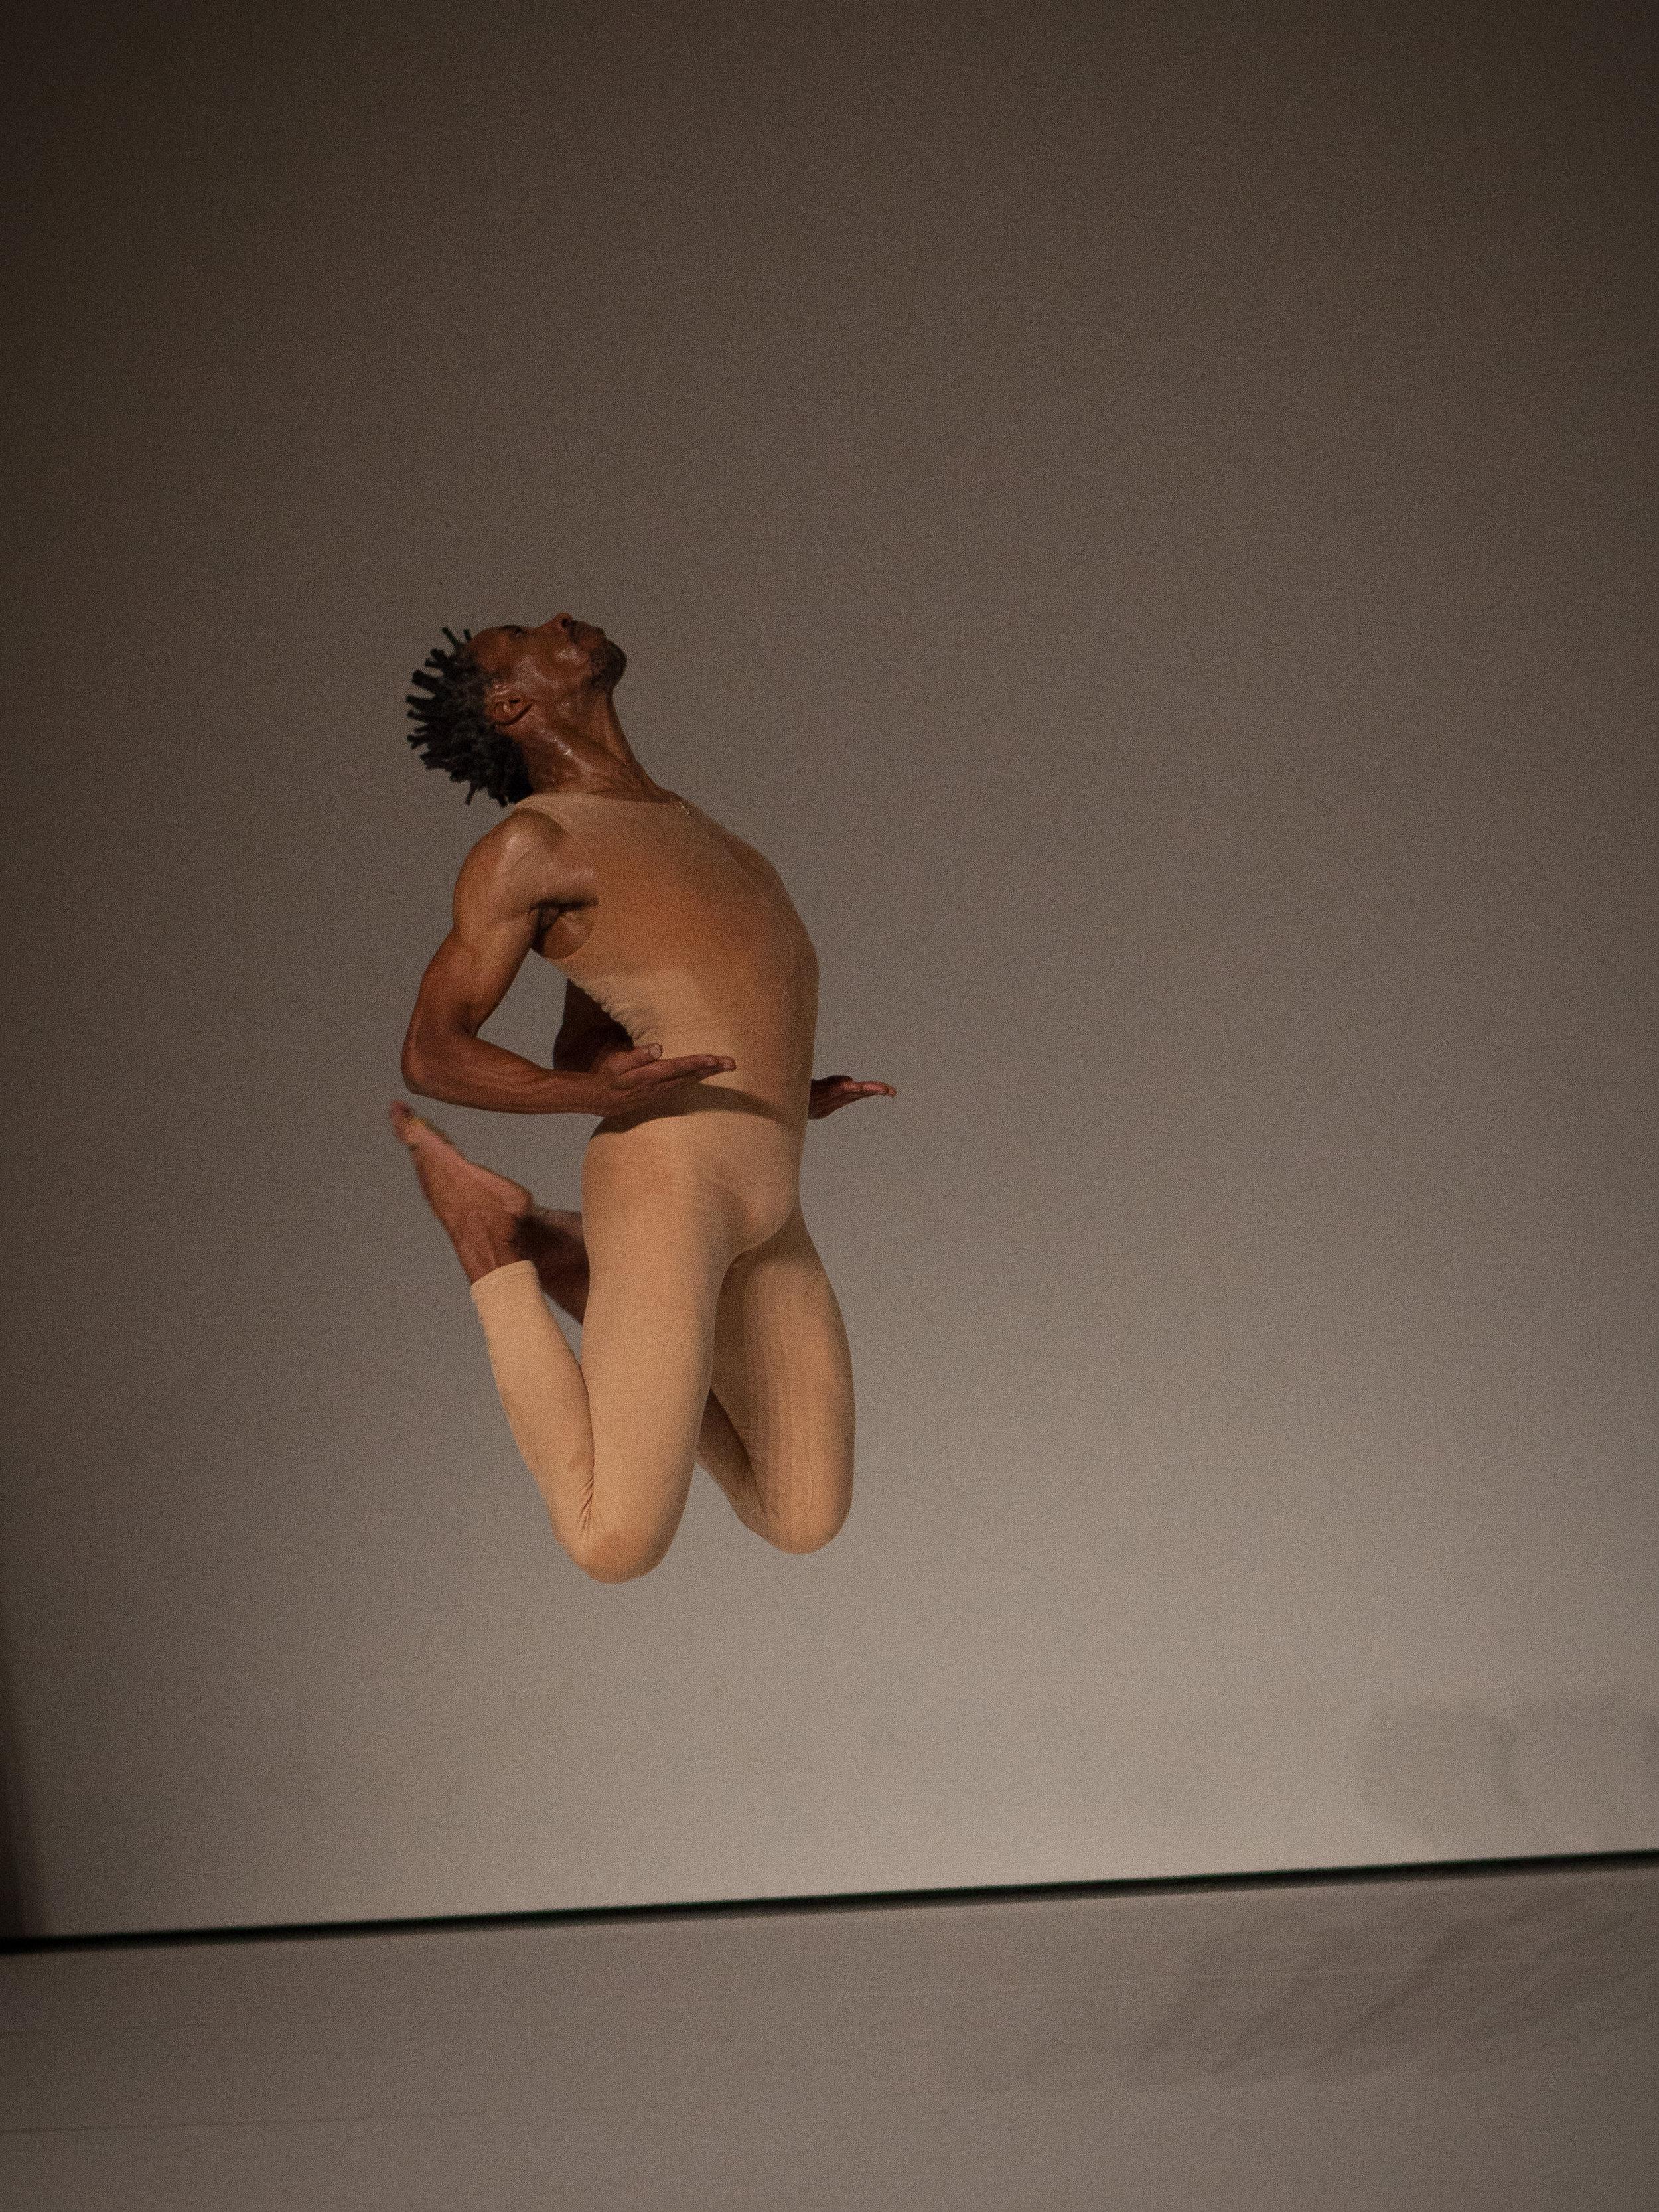 Boris Charmatz @ MOMA: Manifesto for a Dancing Museum